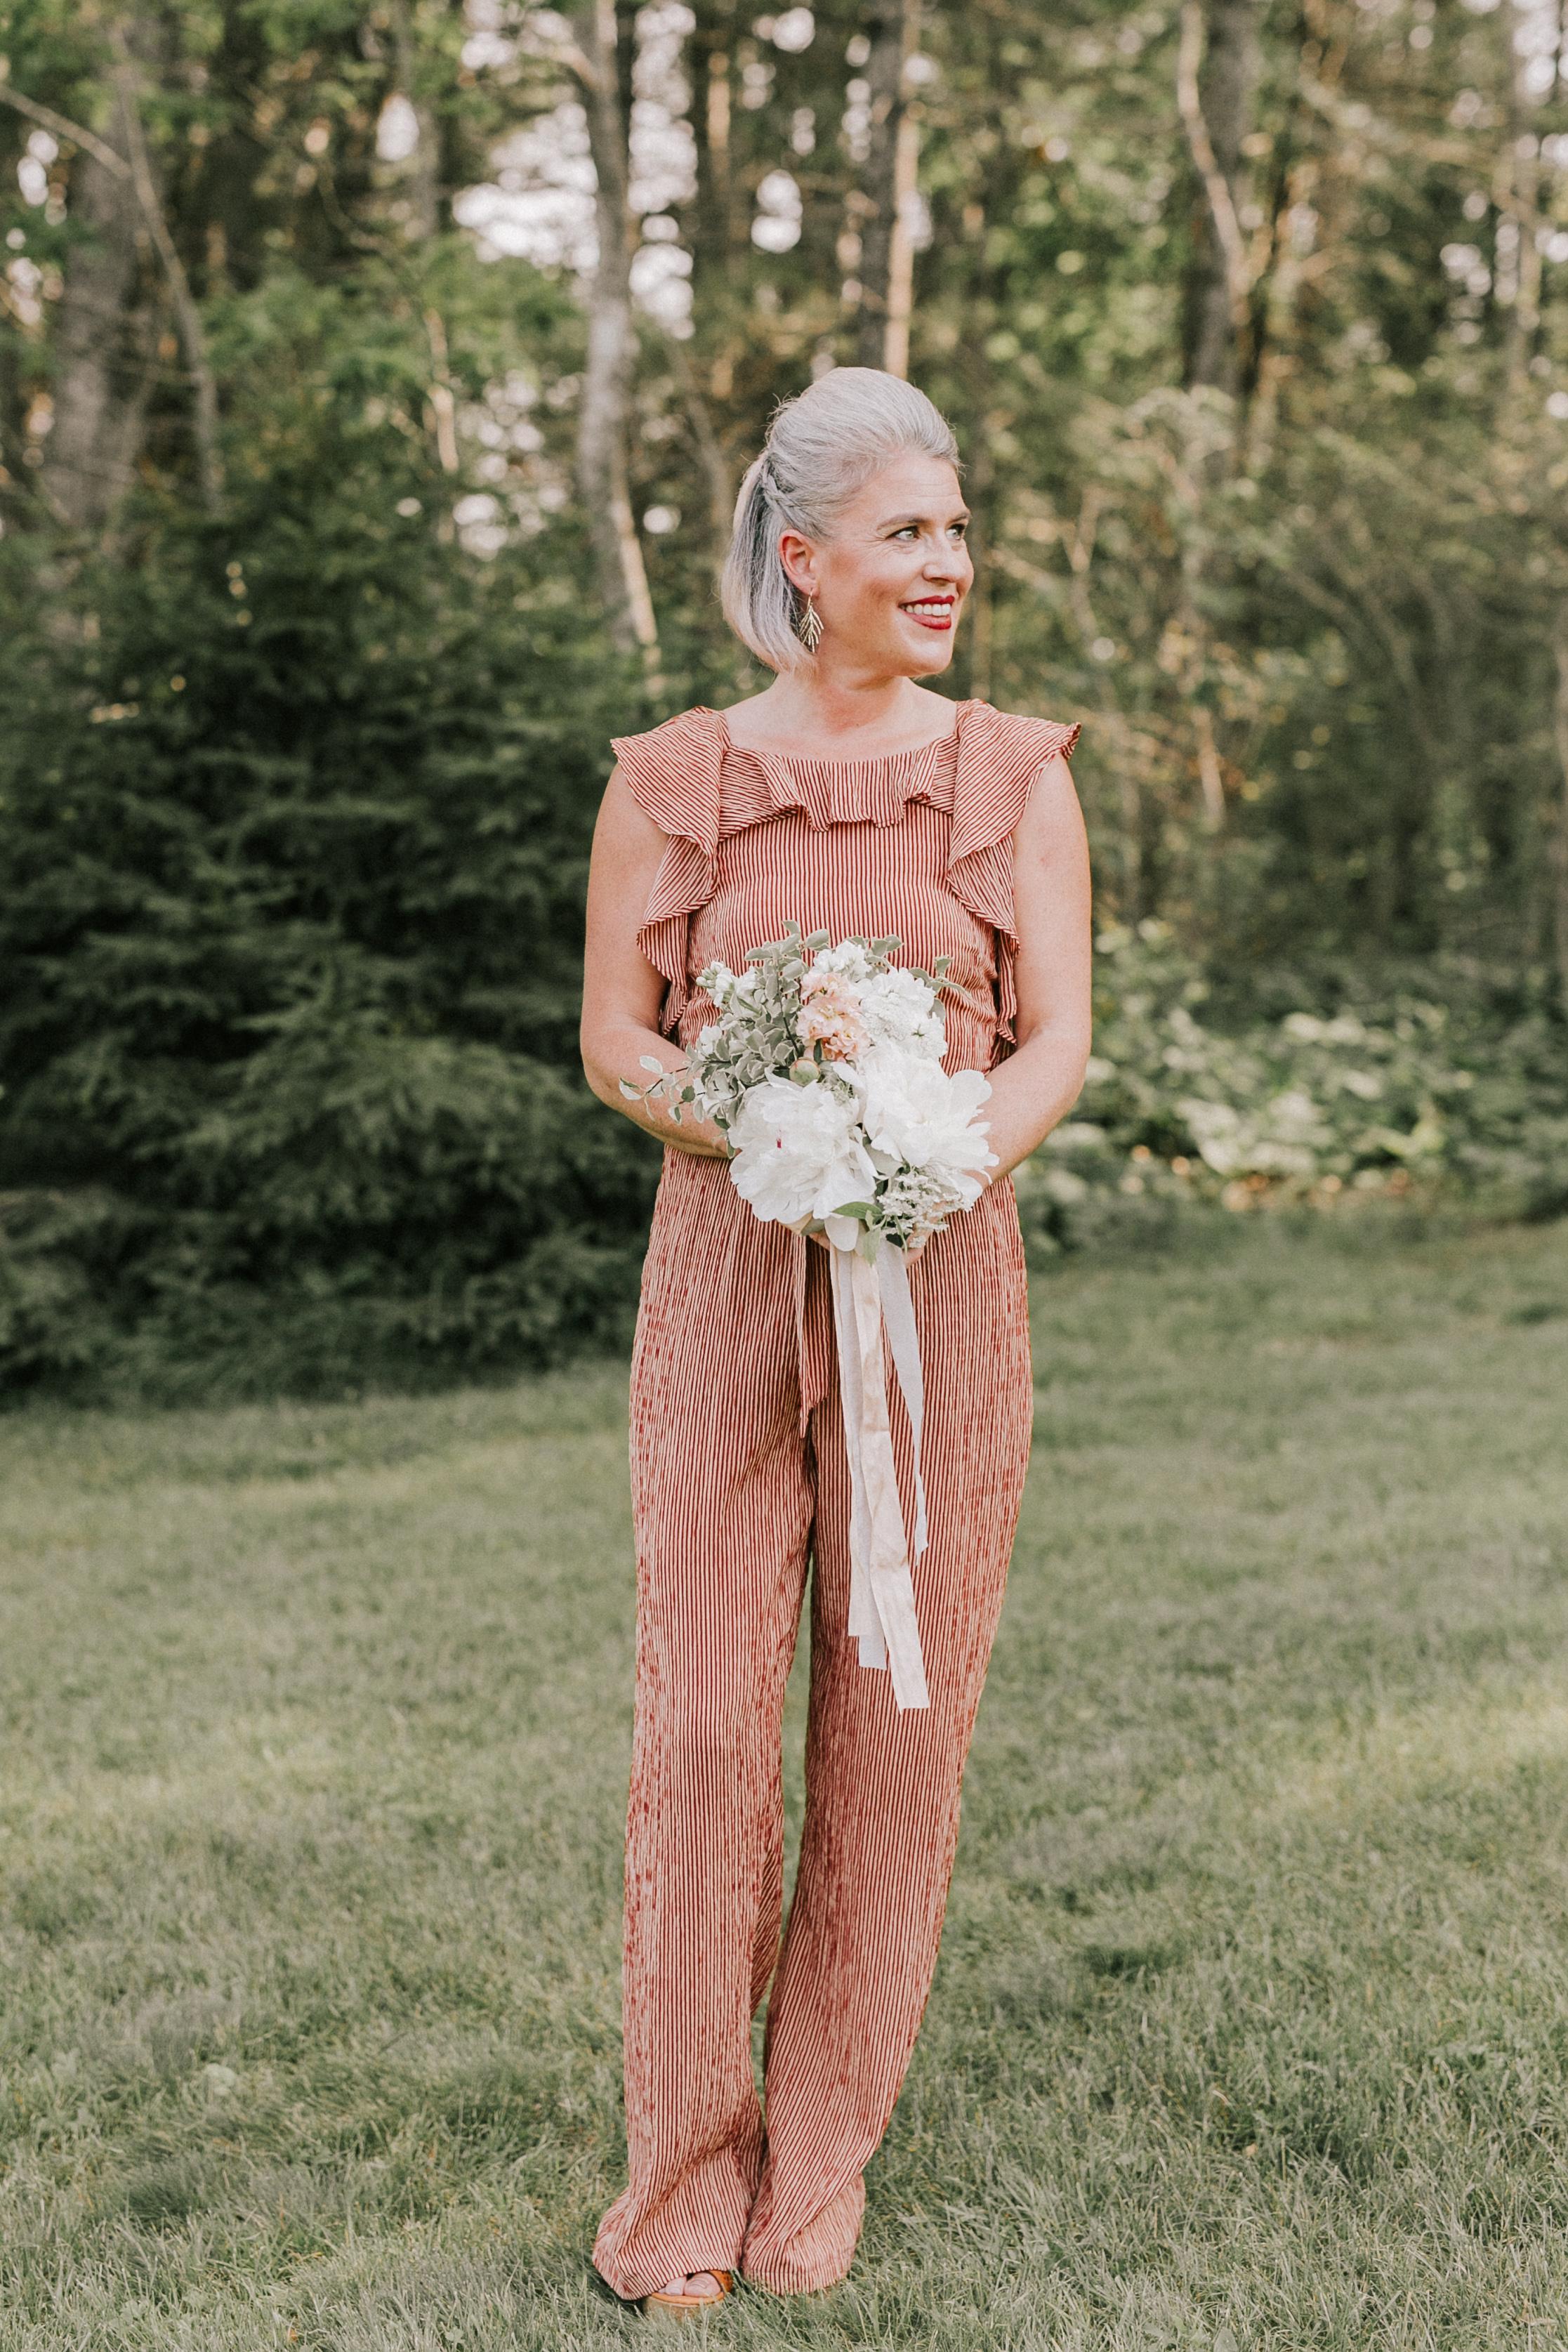 Watershed_Floral_Marianmade_Farm_Wedding_JamieMercurioPhoto2018-361.jpg